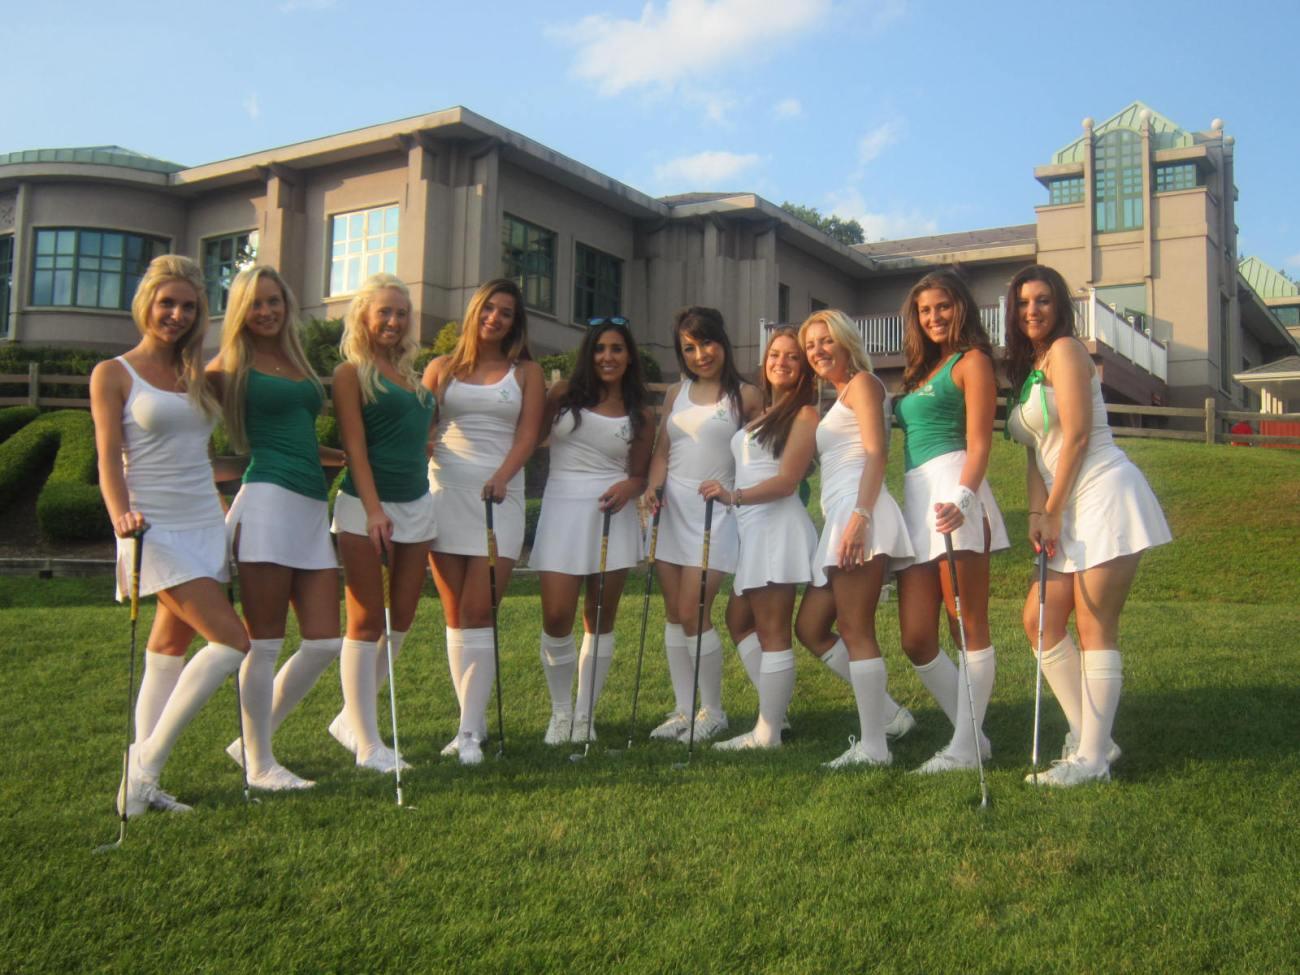 Green Girls Golf Company